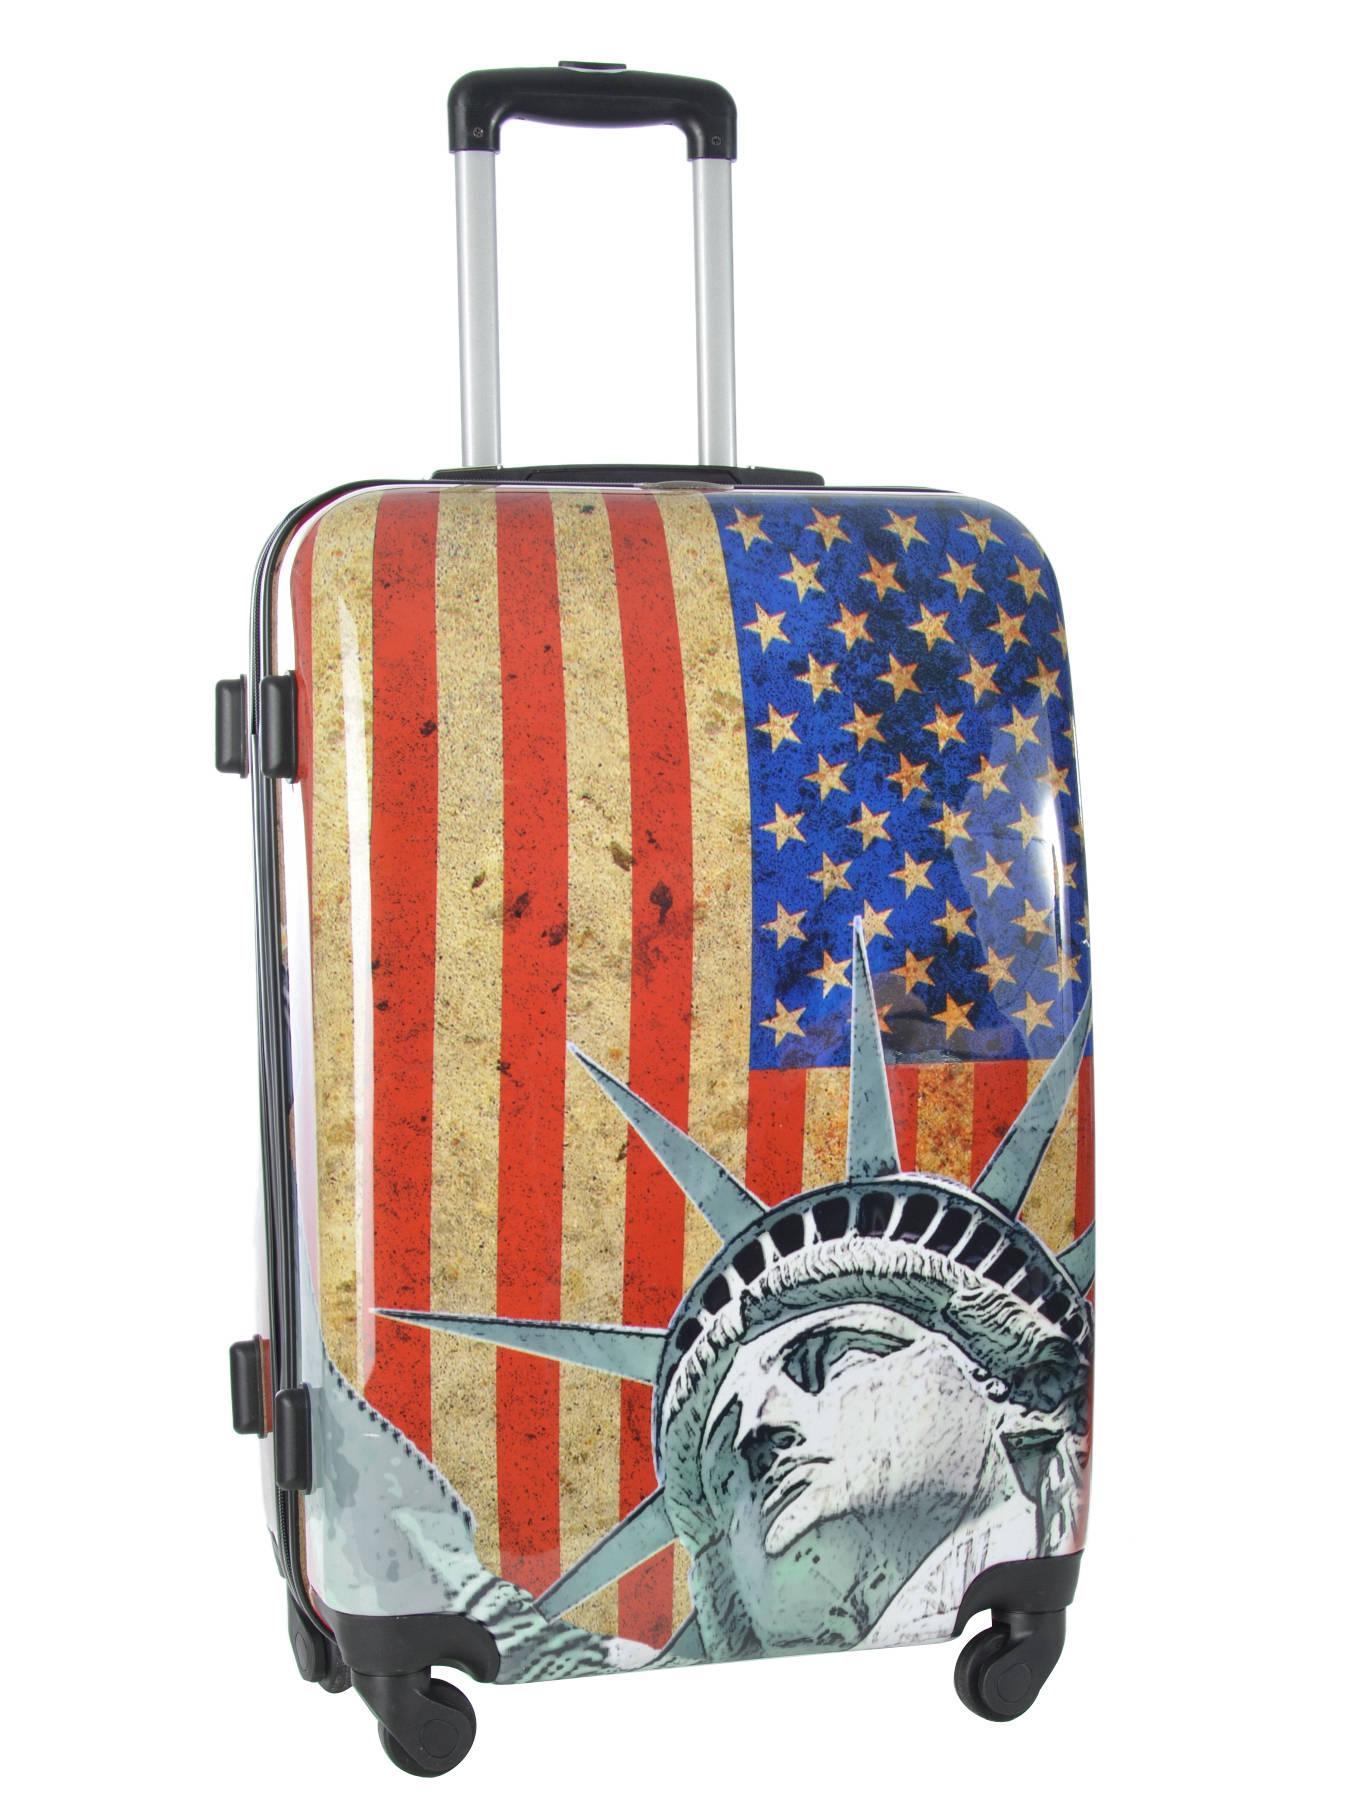 lot de valises travel print shinny multicolor i en vente. Black Bedroom Furniture Sets. Home Design Ideas